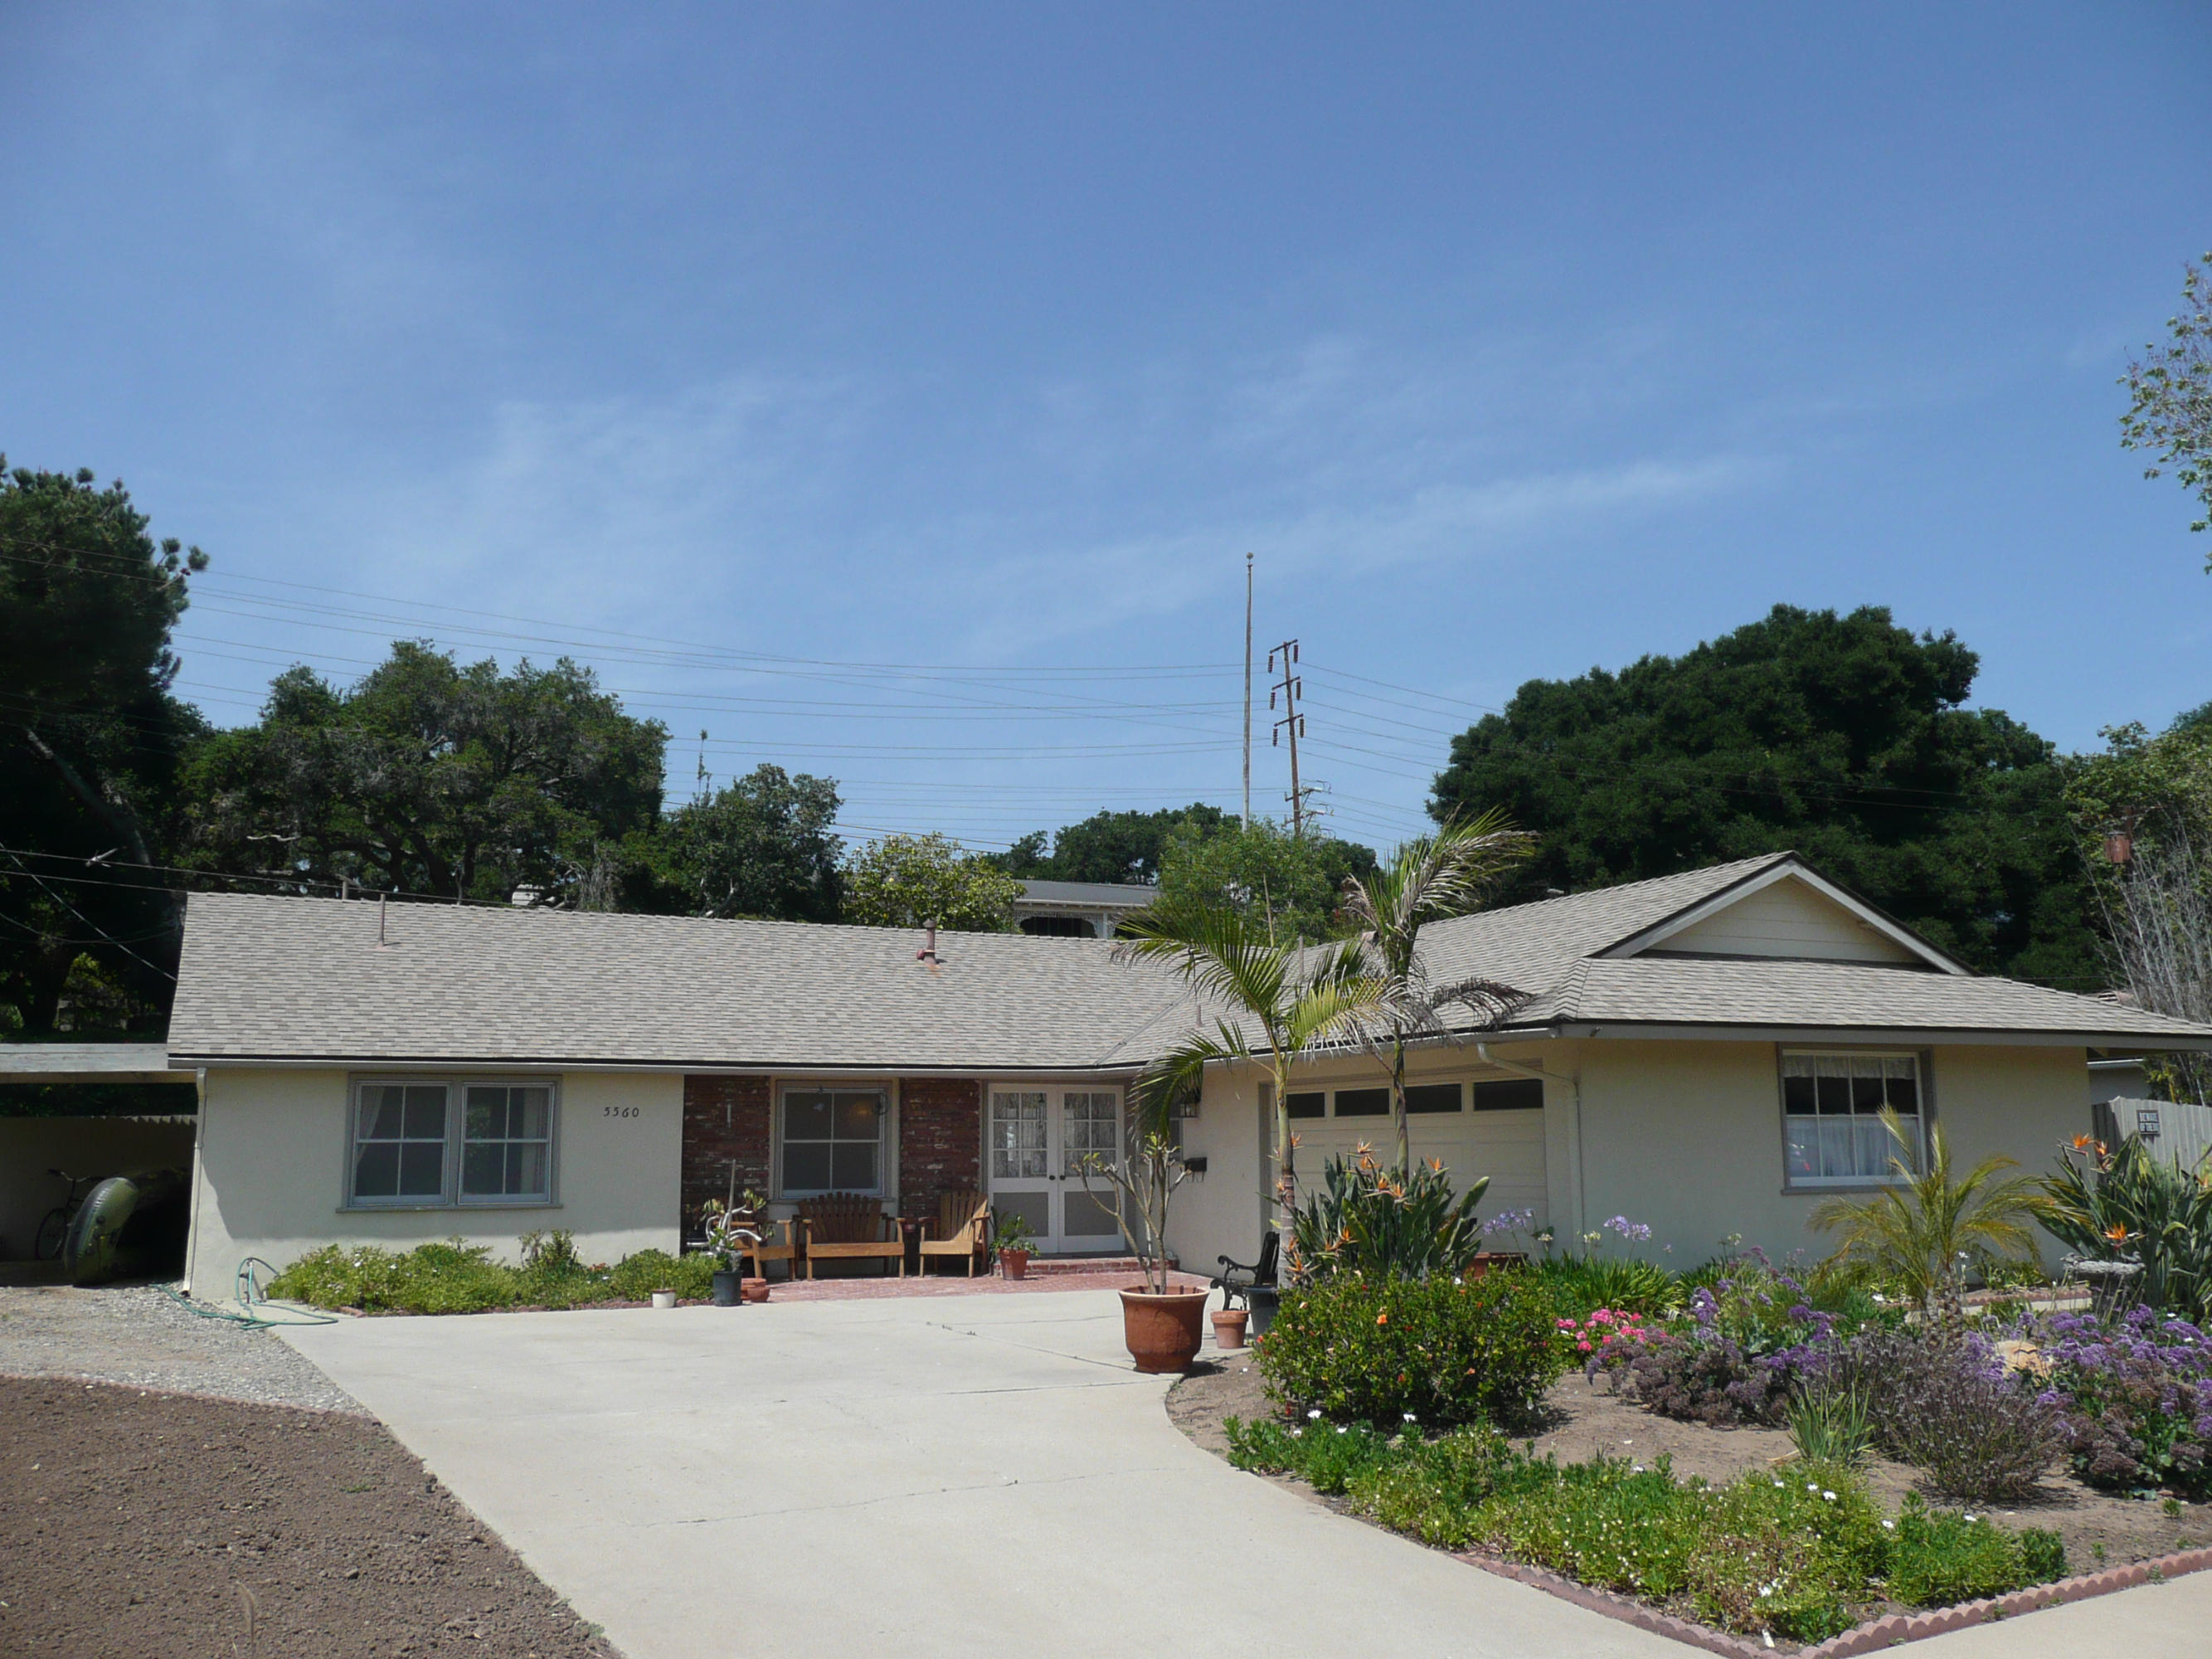 Property photo for 5560 Pembroke Ave Goleta, California 93111 - 14-1456